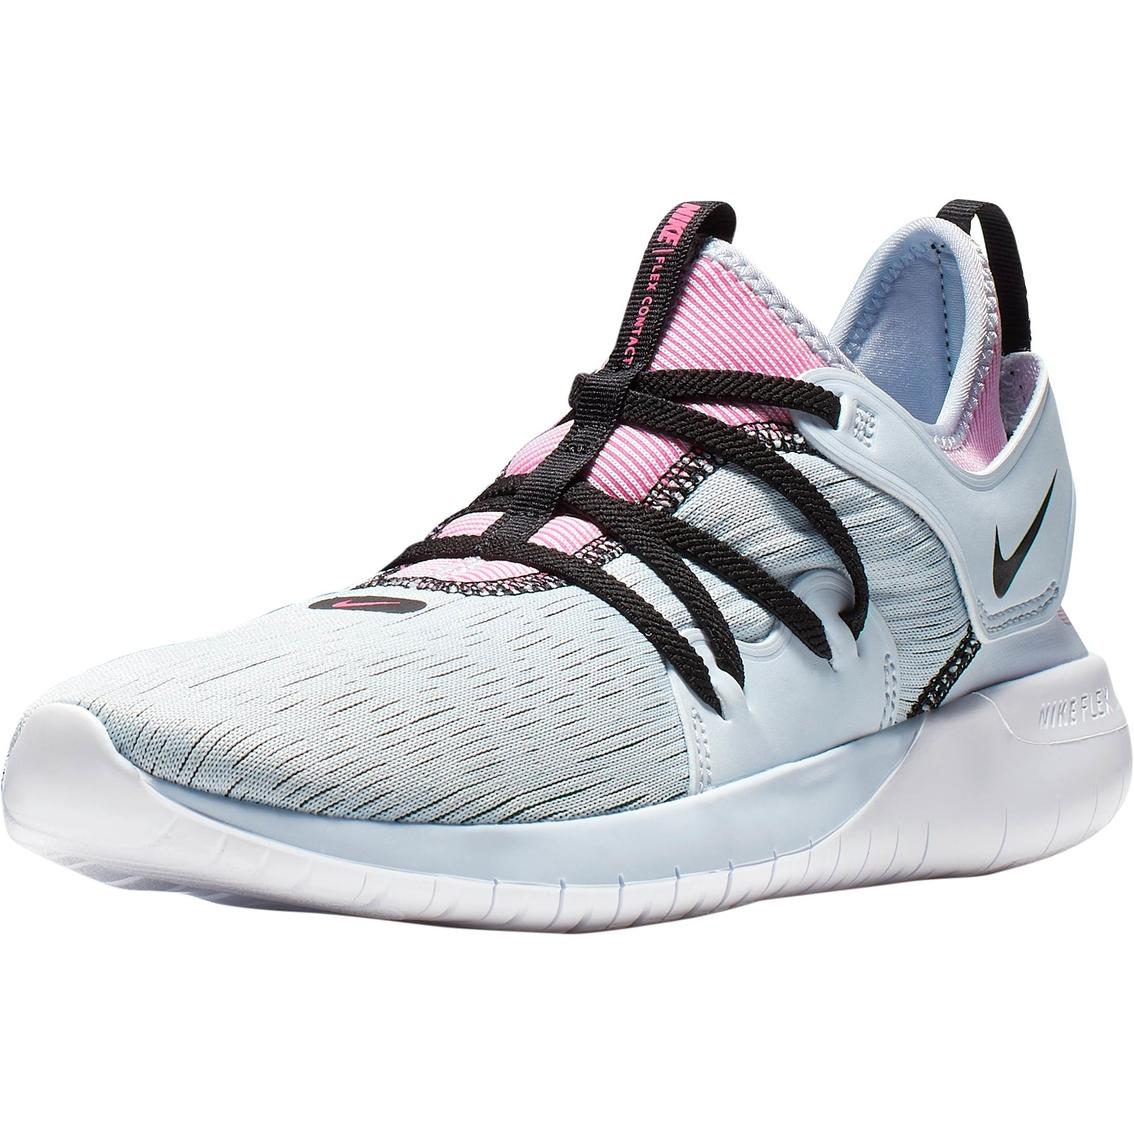 premium selection 284ca 90412 Nike Women's Flex Rn 2019 Running Shoes   Running   Shoes ...